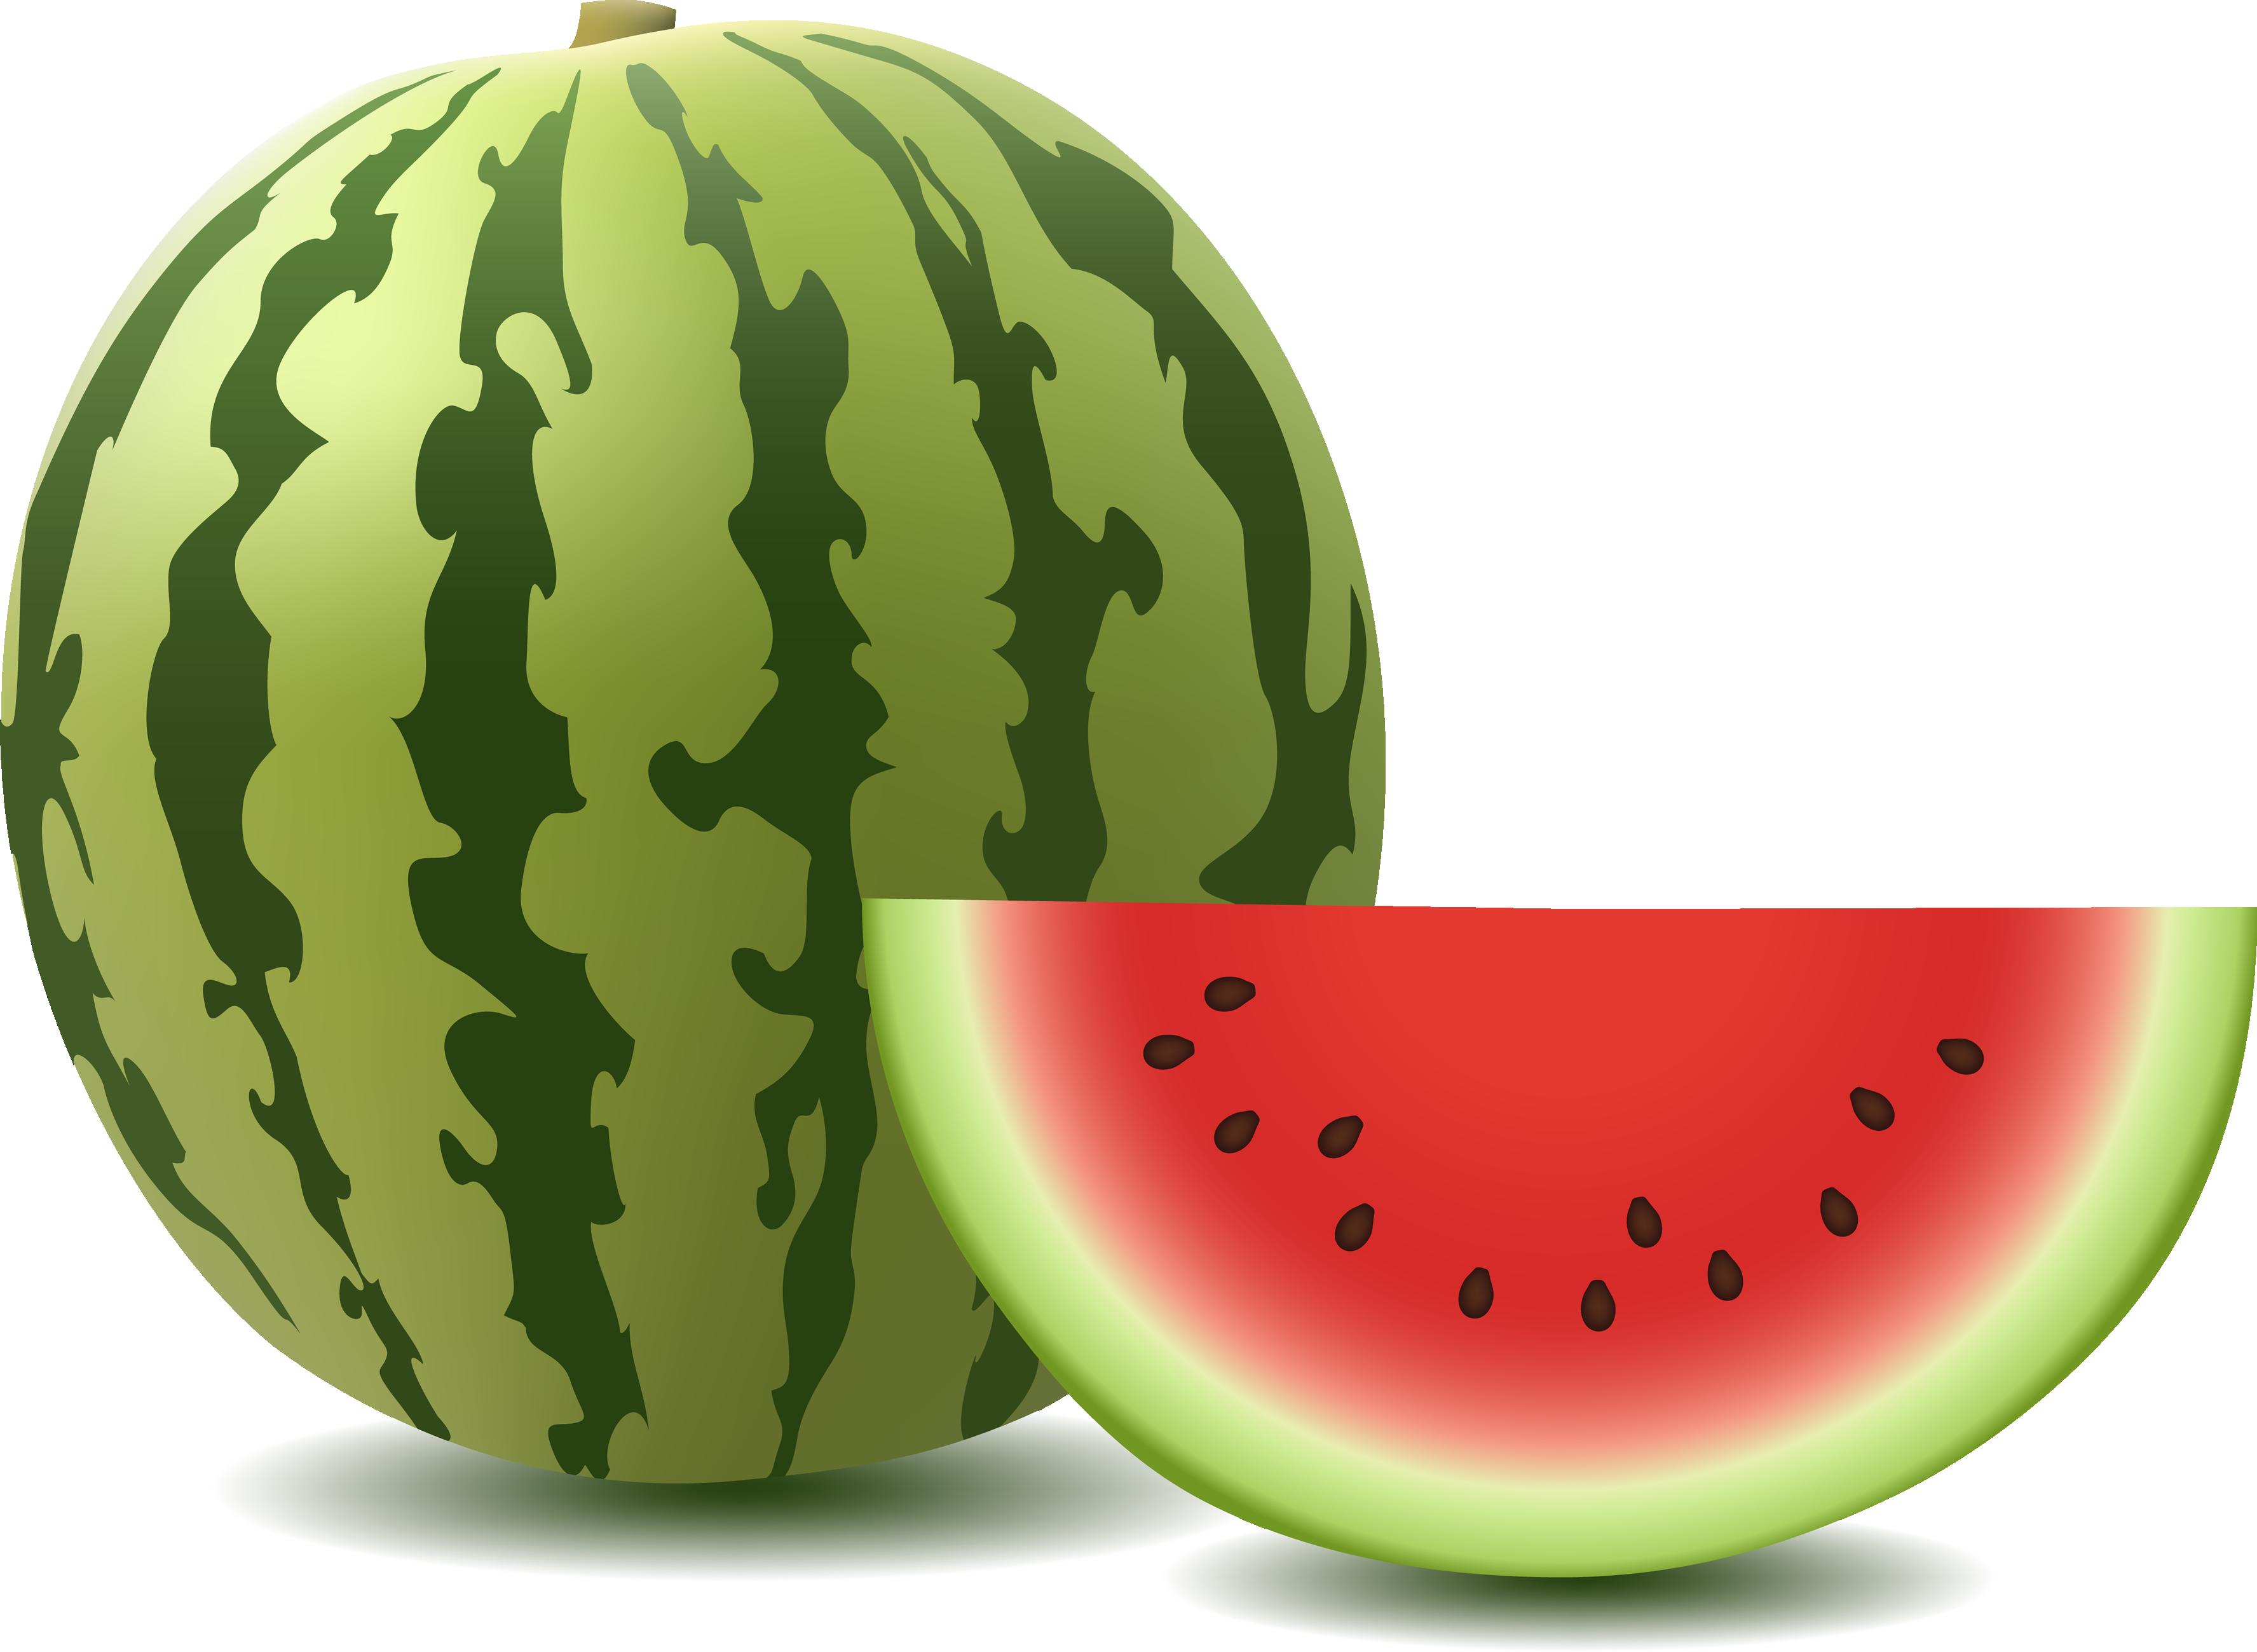 Watermelon xigua clipart clip art freeuse download Melon,Watermelon,Citrullus,Cucumber, gourd, and melon family ... clip art freeuse download